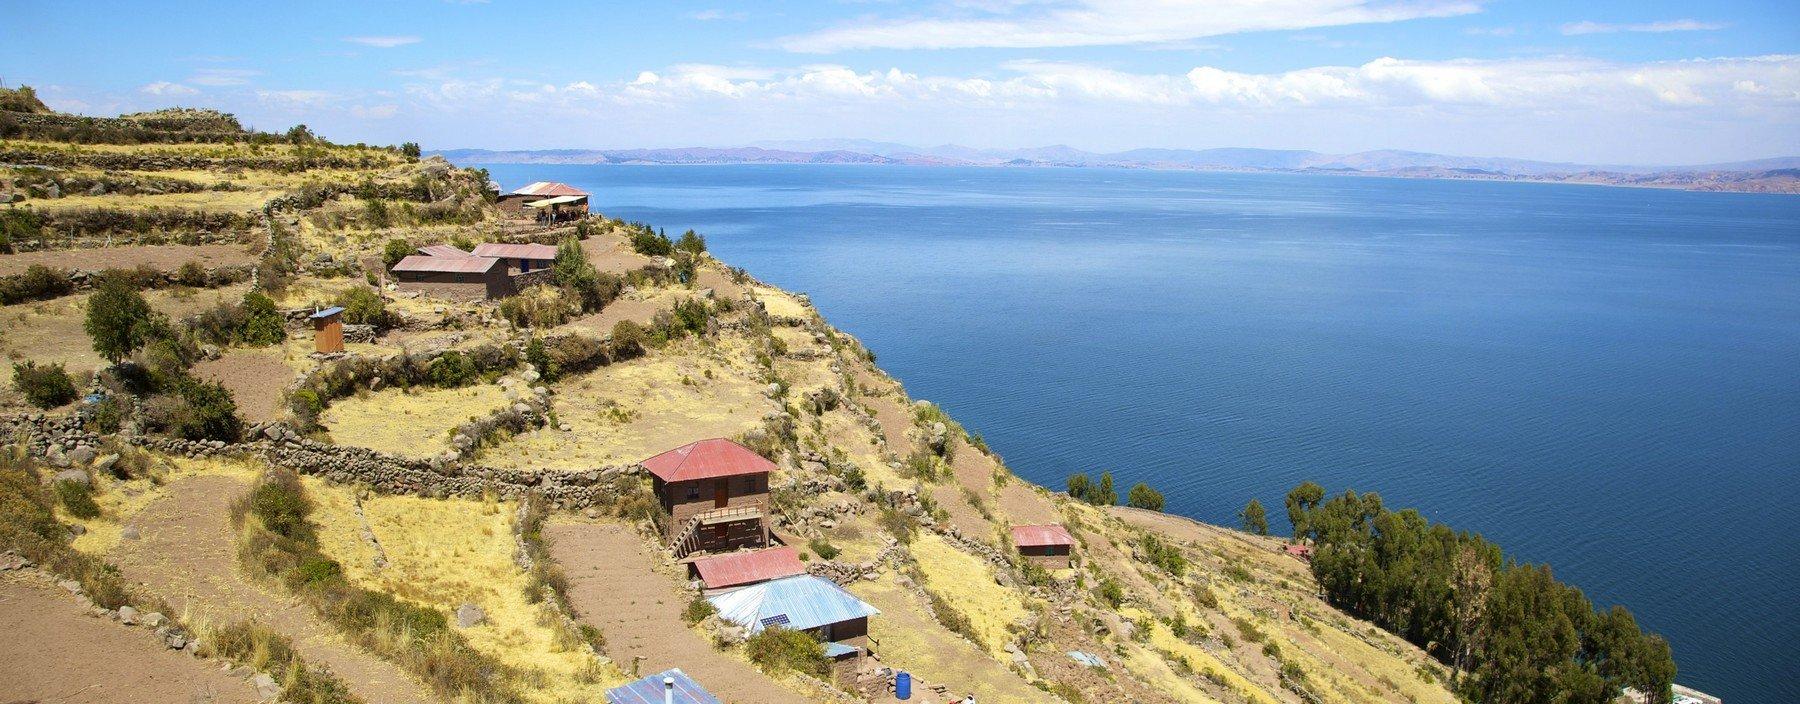 pe, titicaca lake, amantani island (1).jpg